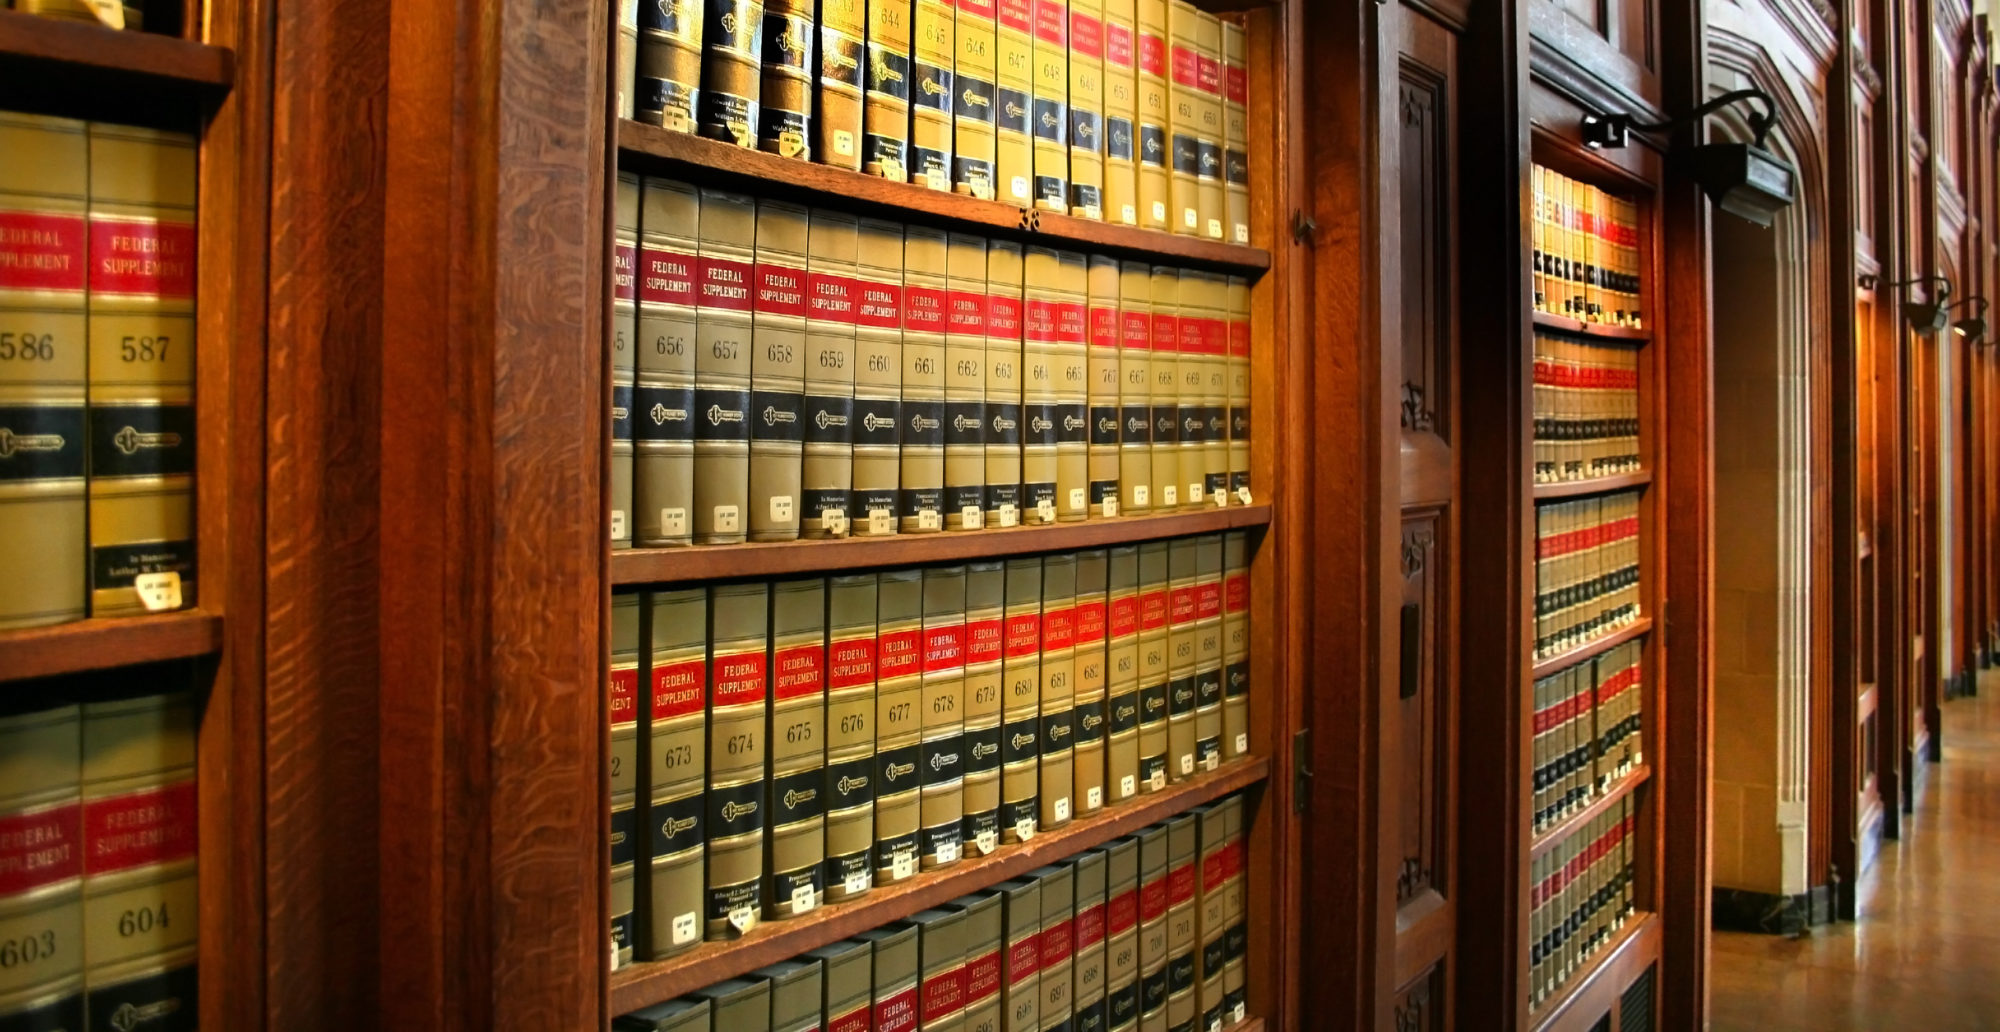 Connolly, Trillo & Yates, formerly Trillo, Perello & Yates, Barristers Solicitors & Notaries Public